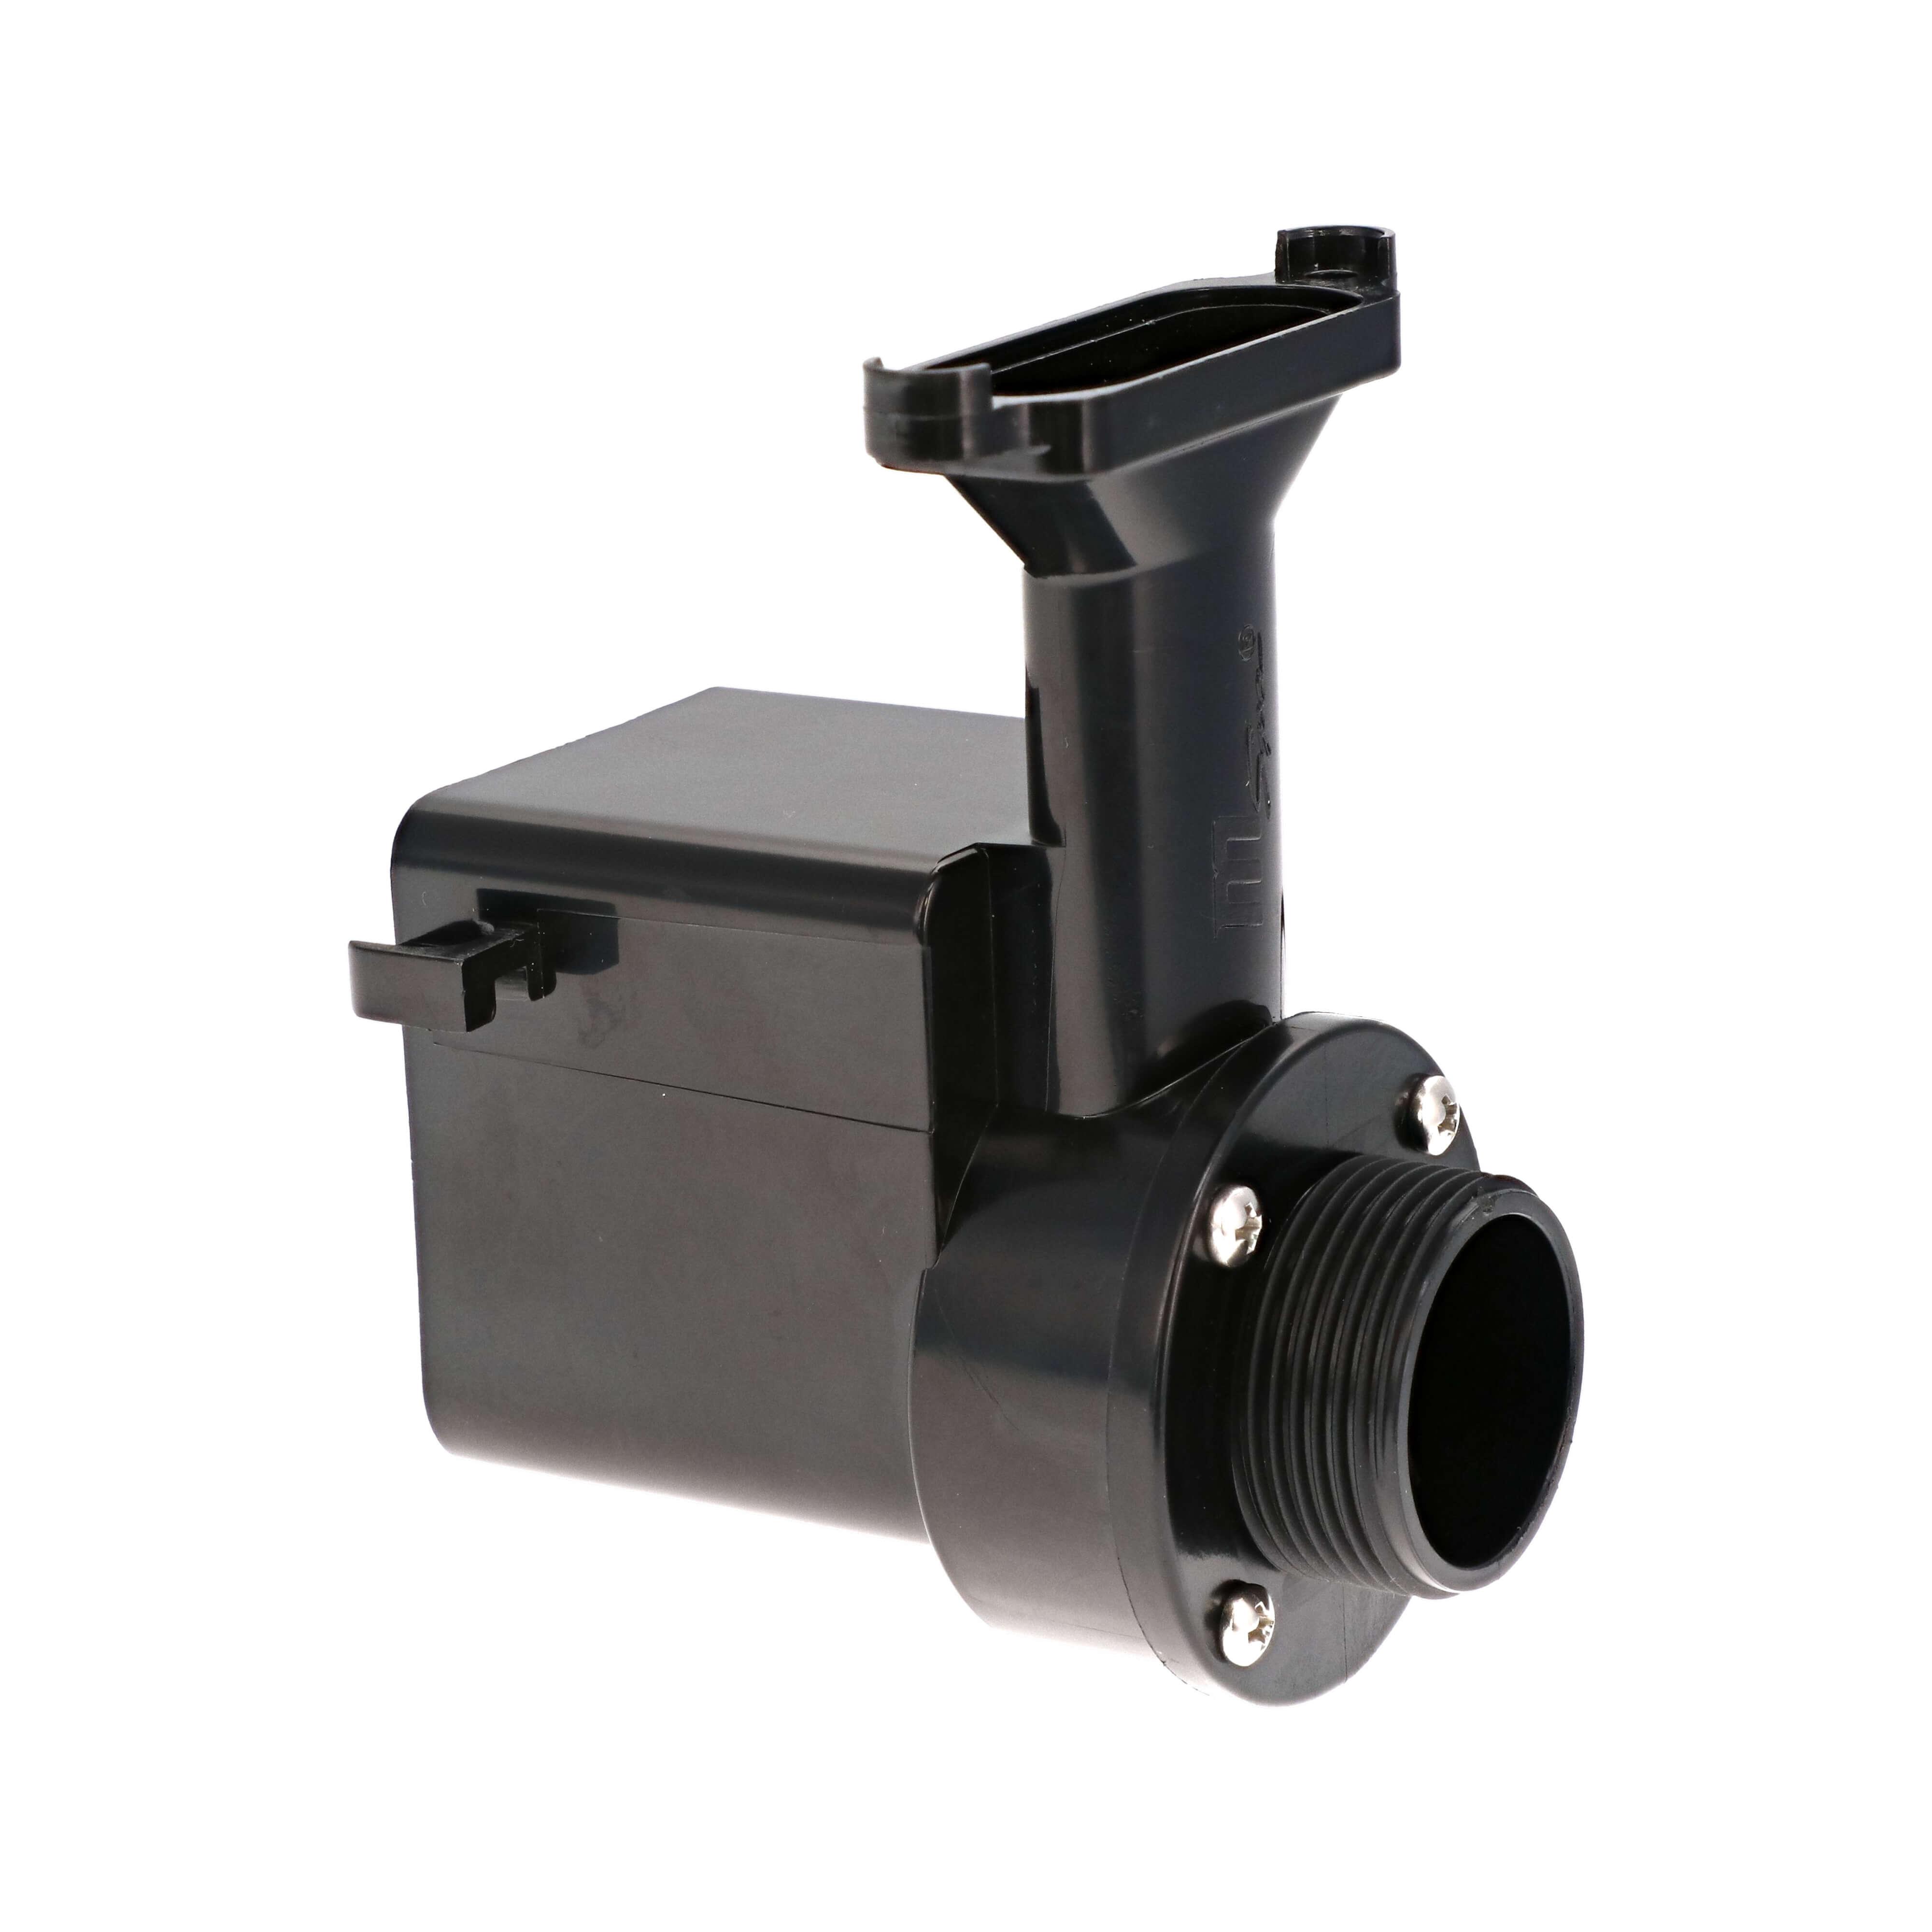 Pompe de filtration MSPA Lite 2020